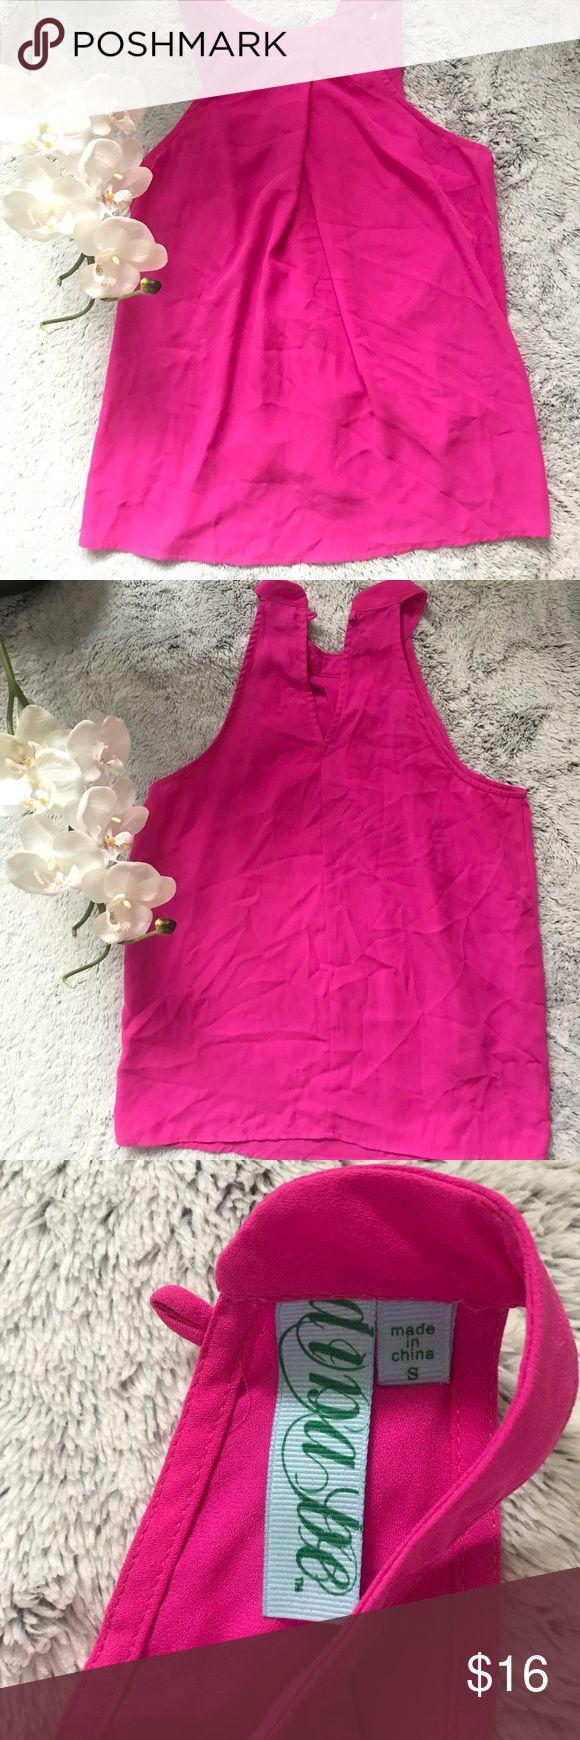 Francesca's hot pink blouse Tank top size S Tops Tank Tops